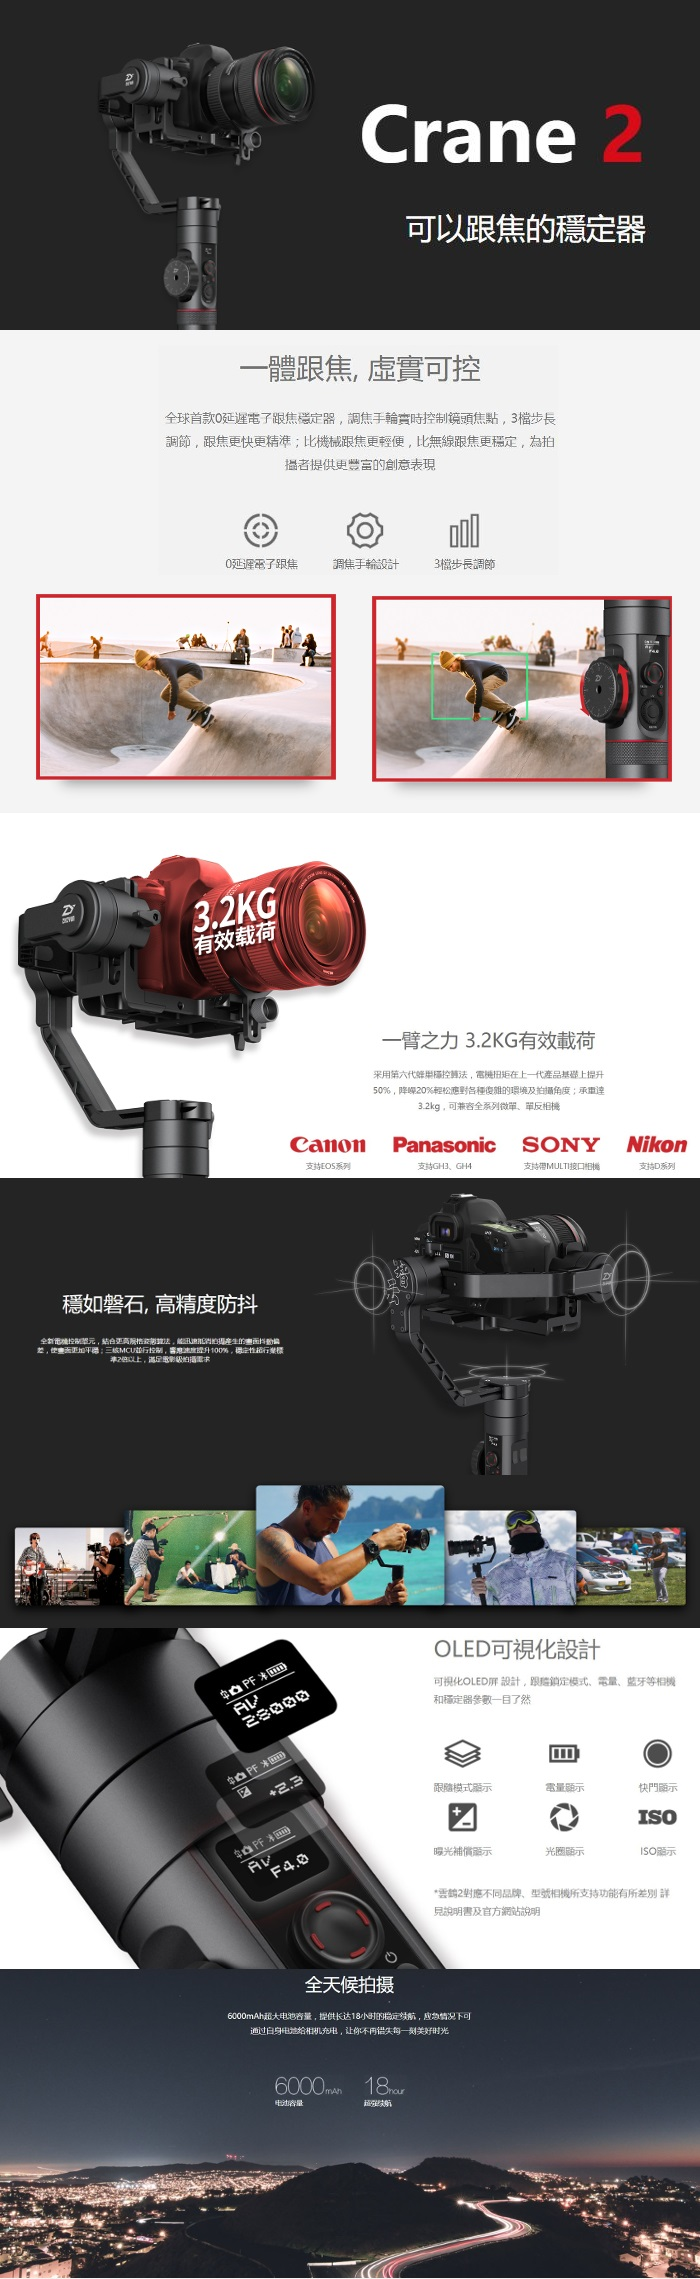 zhiyun-crane-2-dslr-gimble-d-yingkee1.jpg